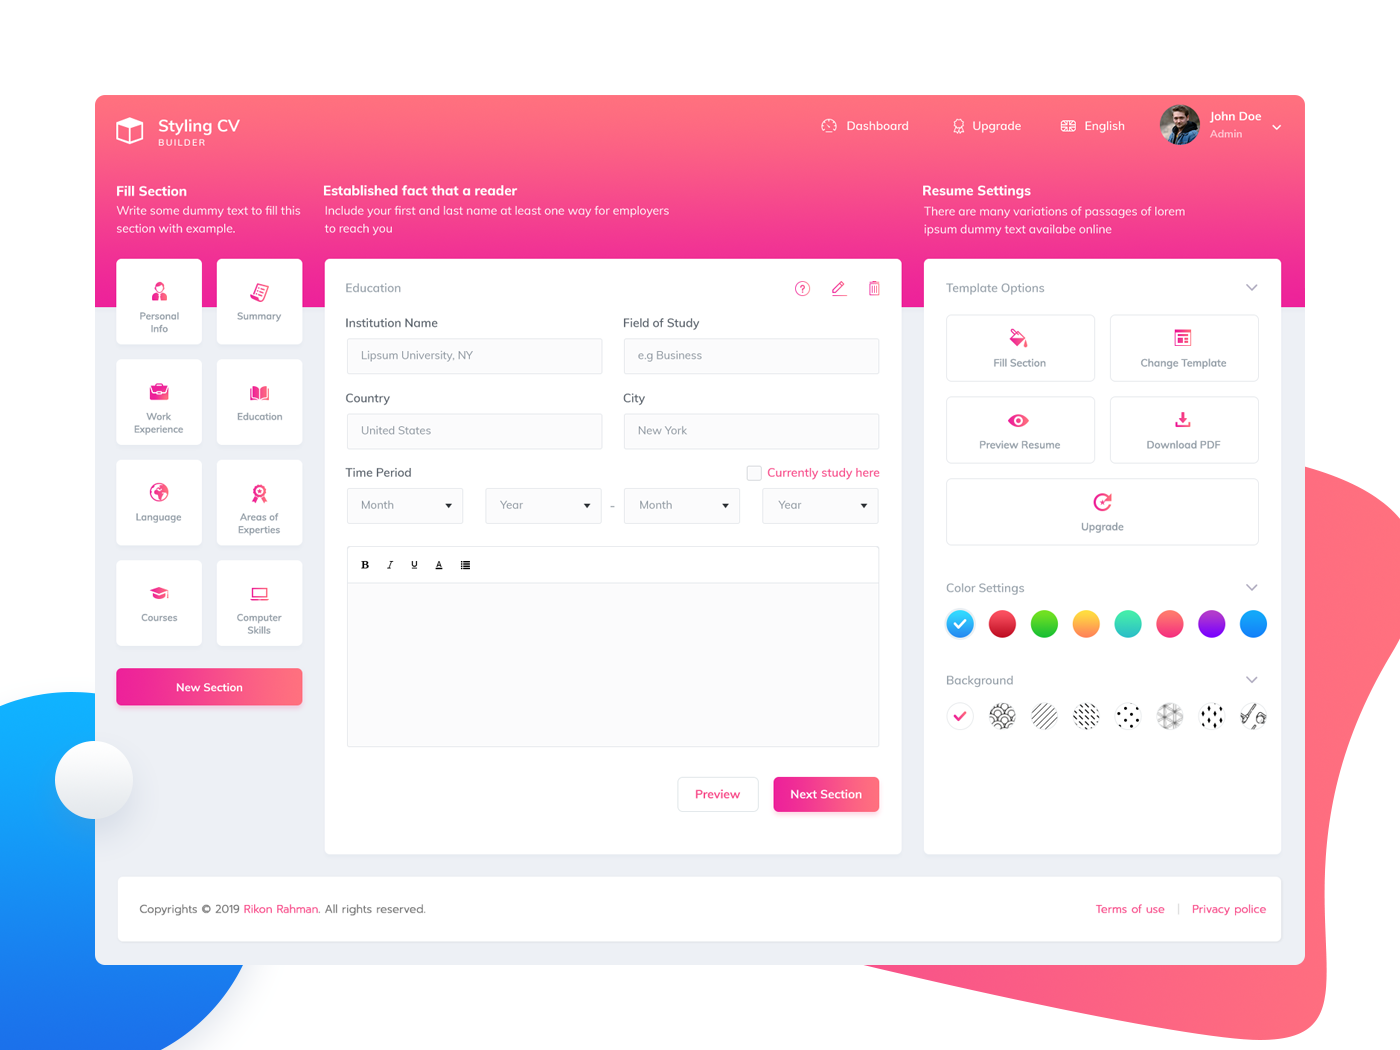 Resume Builder App Ui Design By Rikon Rahman Dribbble Dribbble